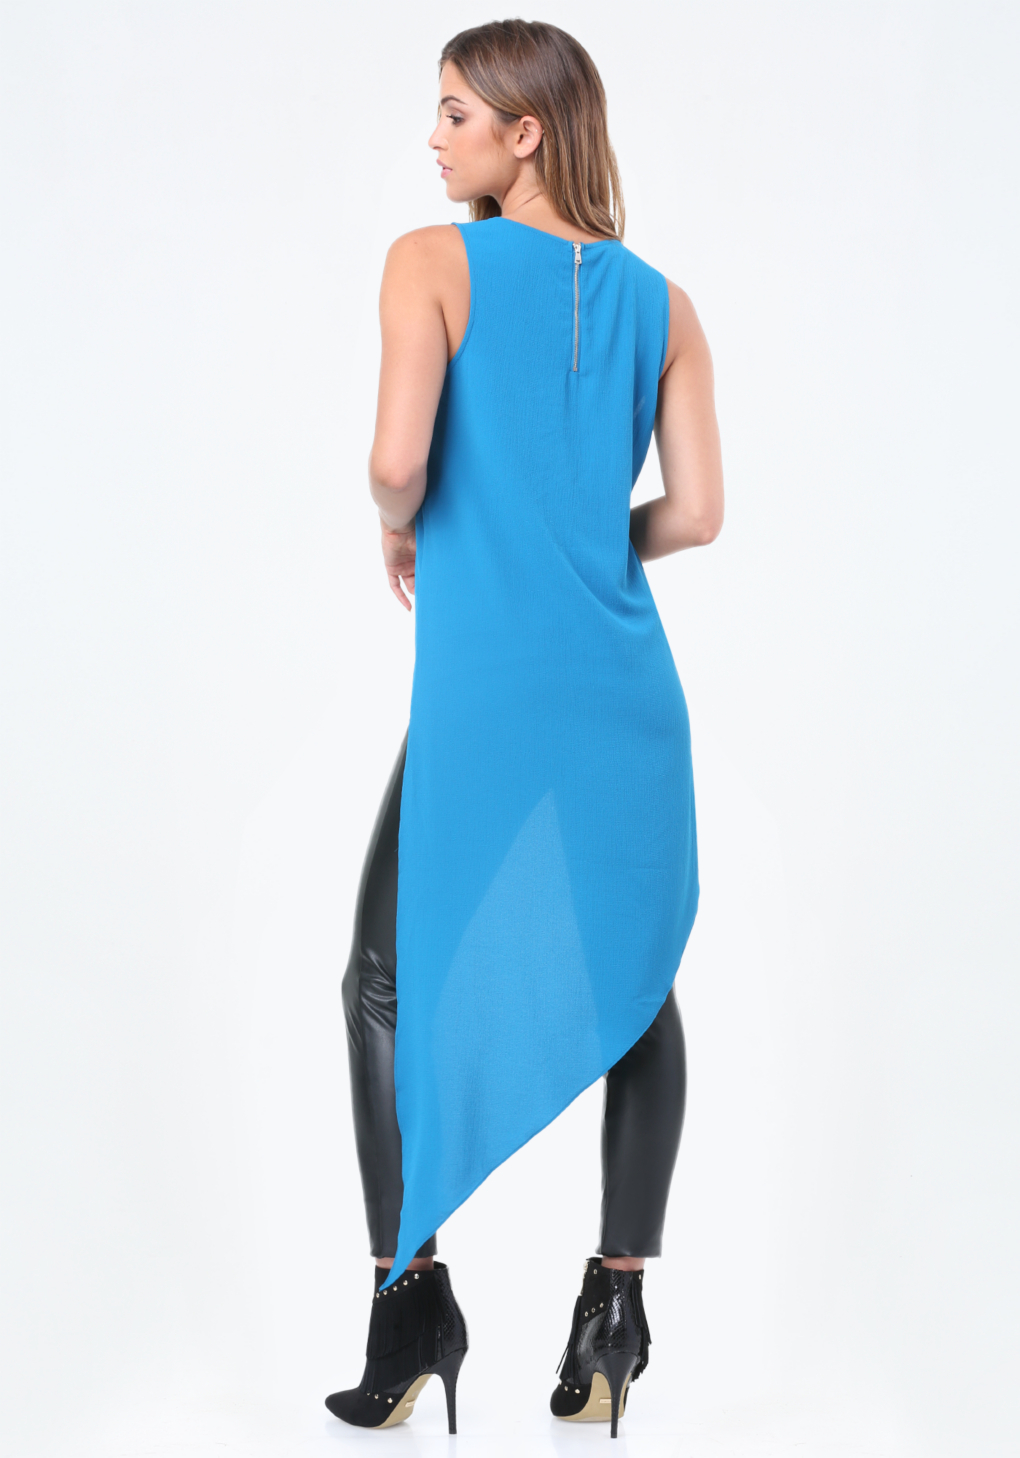 Bebe Synthetic Asymmetric Sleeveless Tunic in Blue